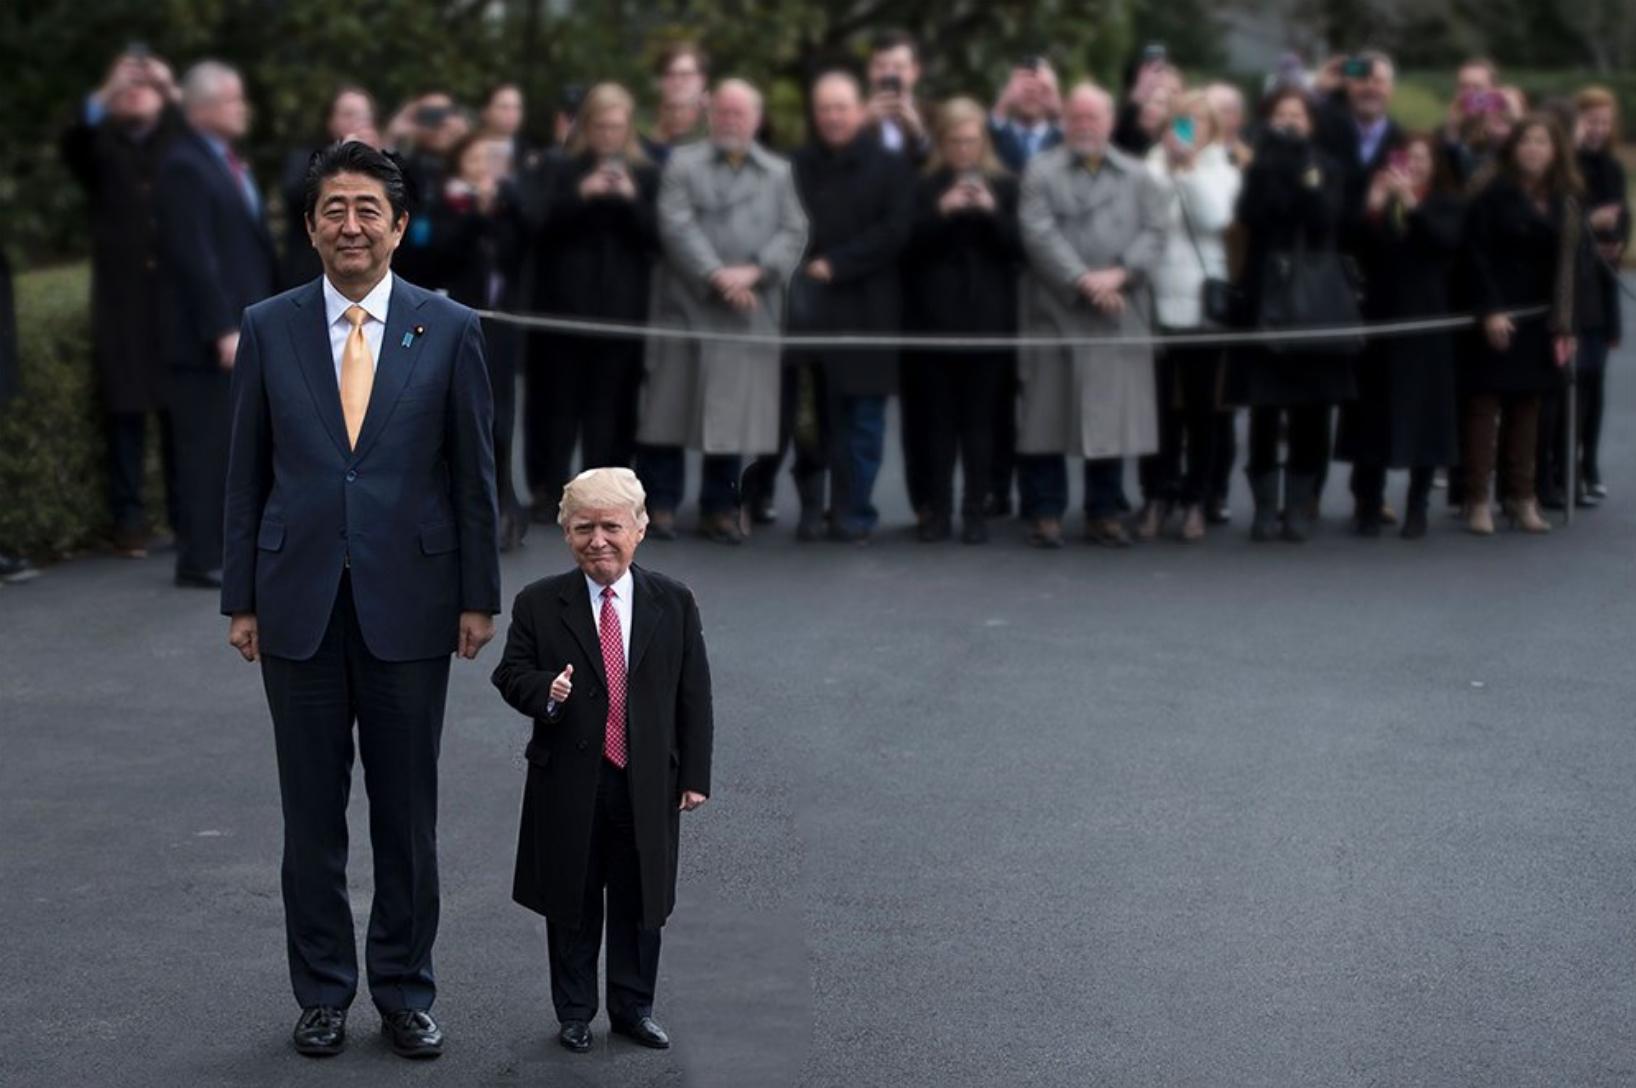 Tiny Trump7.jpg